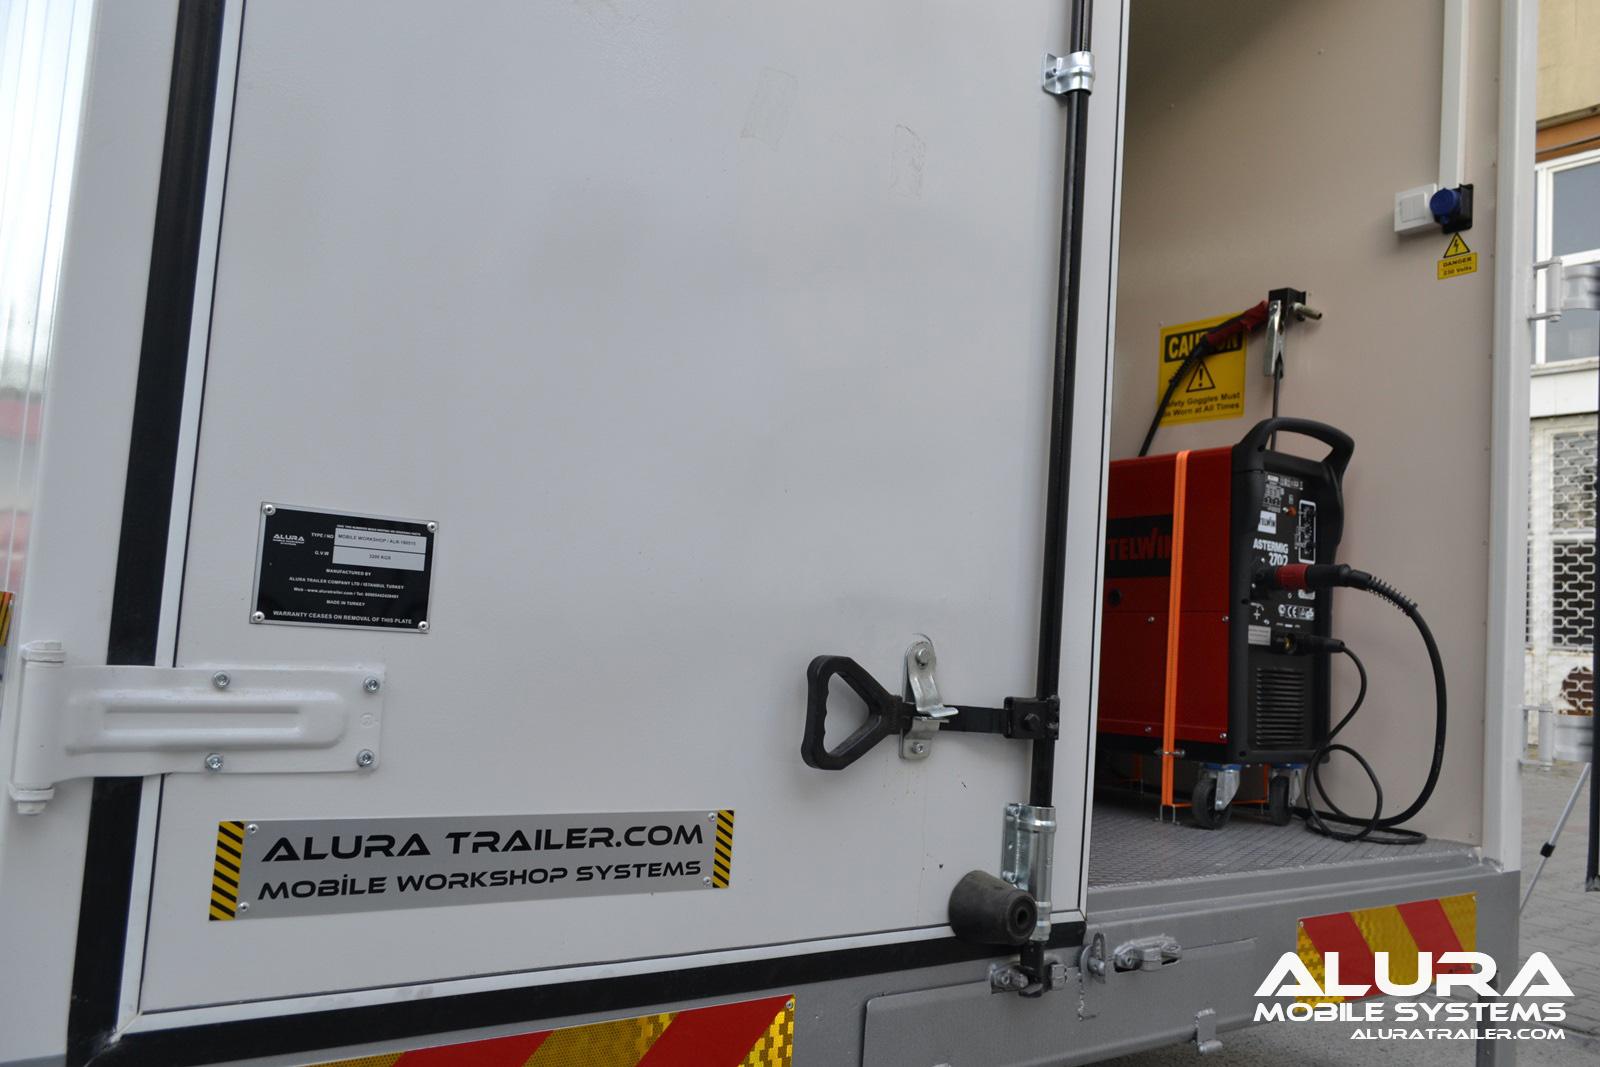 Alura Trailer - Turkey - Truck mounted mobile workshop